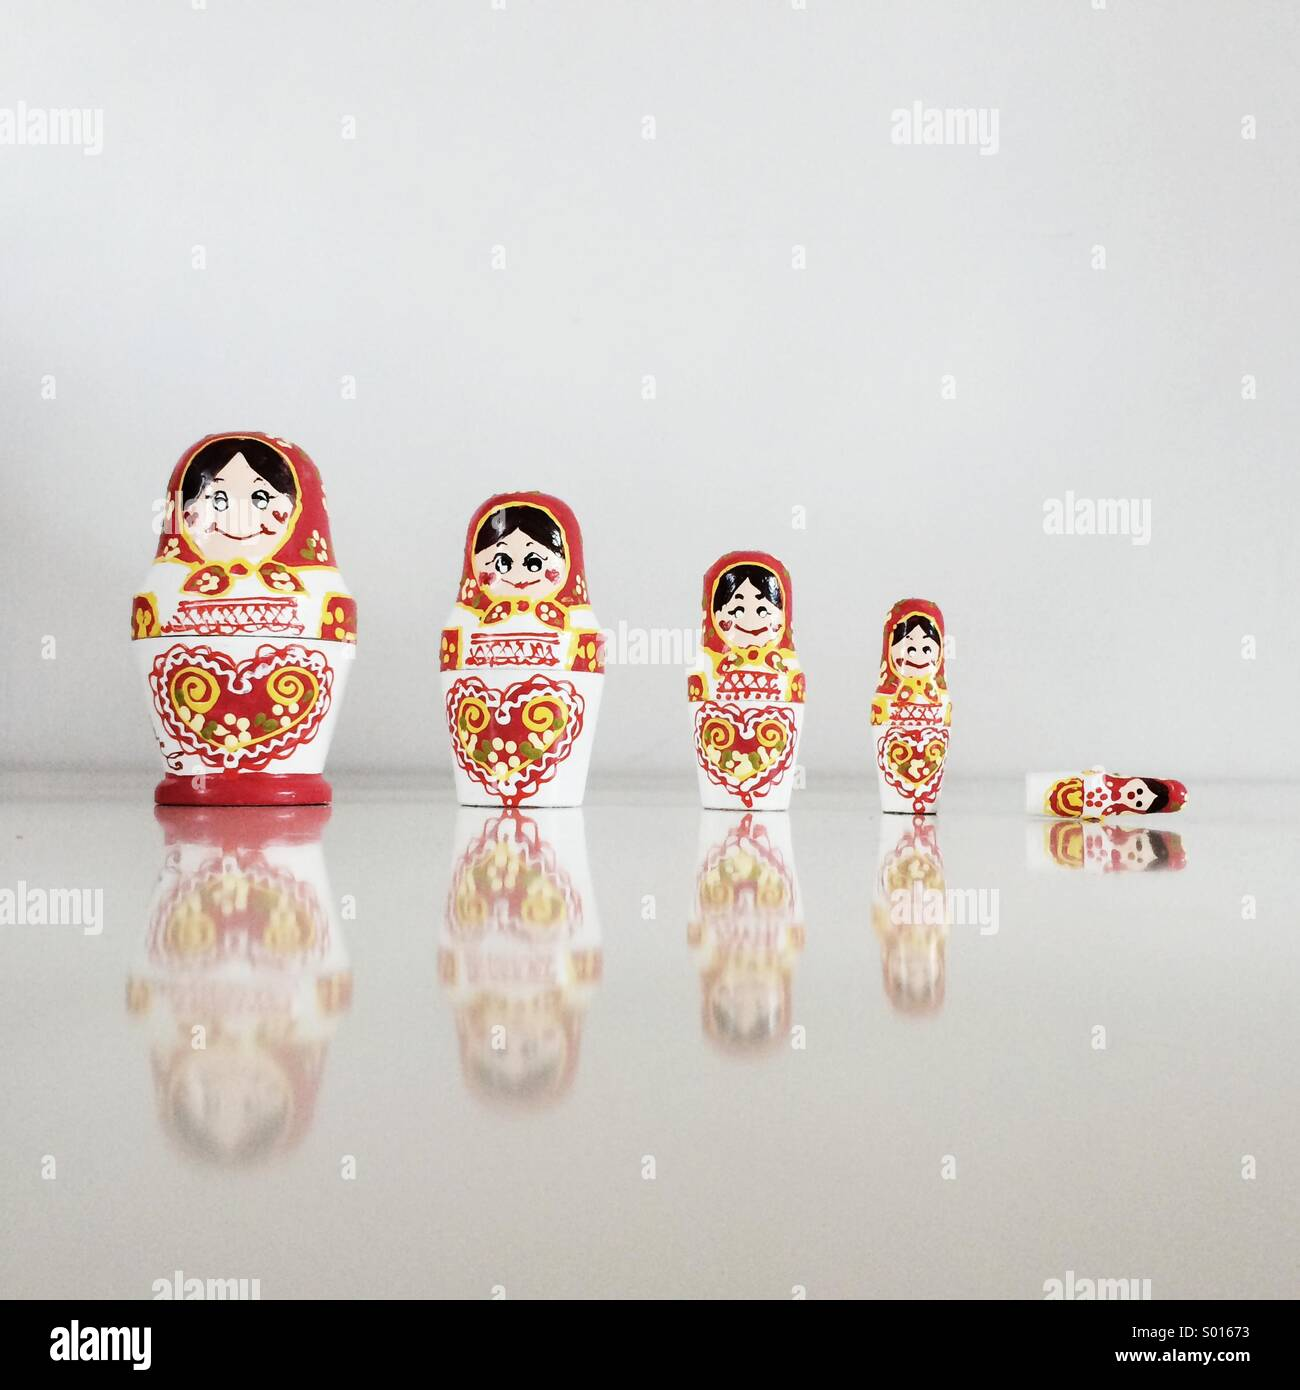 Russian dolls - Stock Image